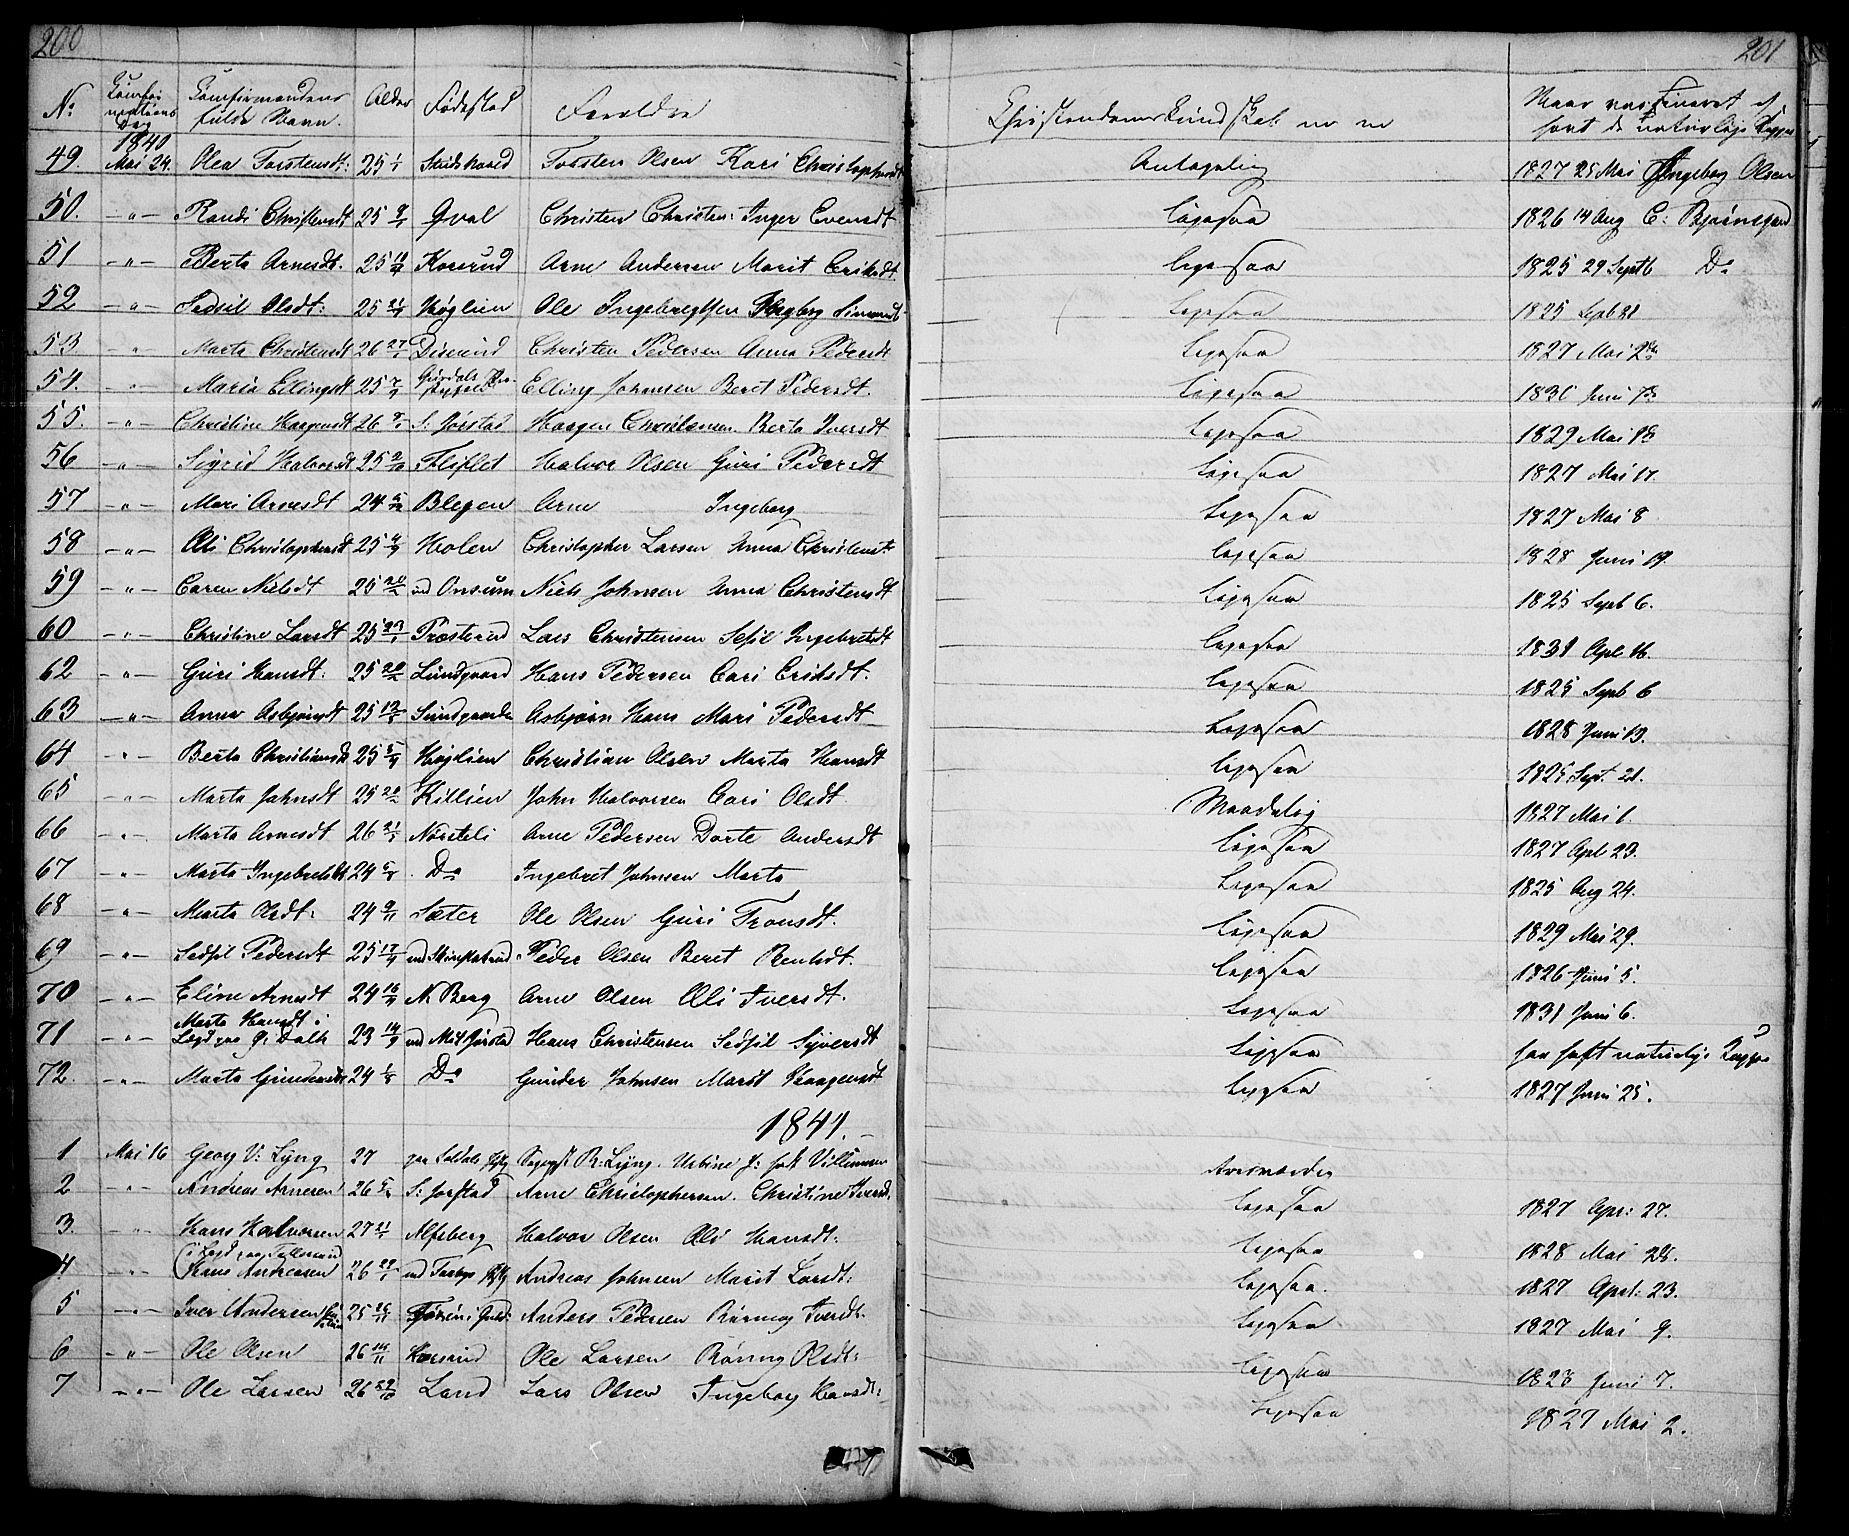 SAH, Fåberg prestekontor, Klokkerbok nr. 5, 1837-1864, s. 200-201